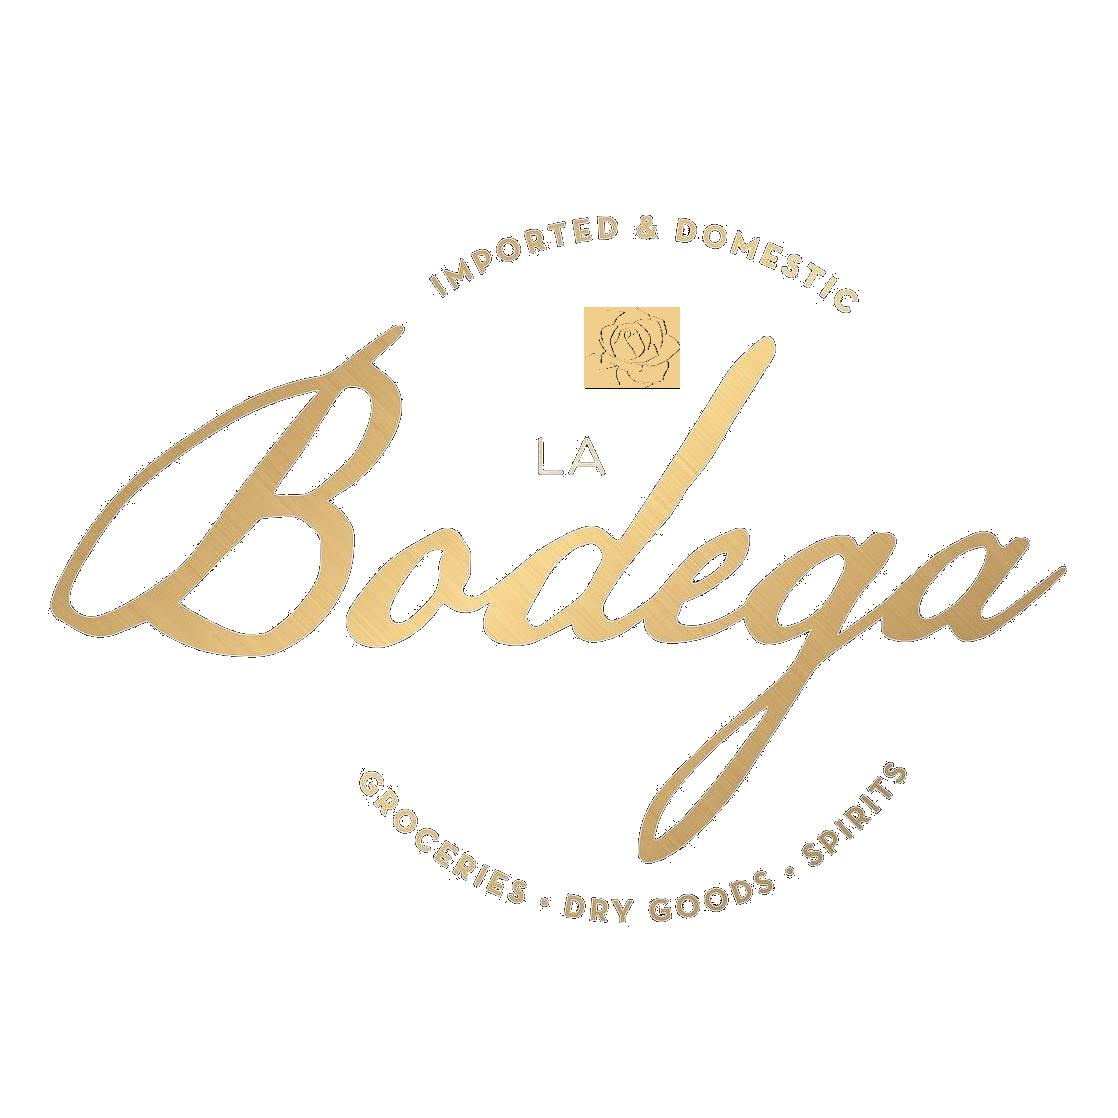 Bodega gold